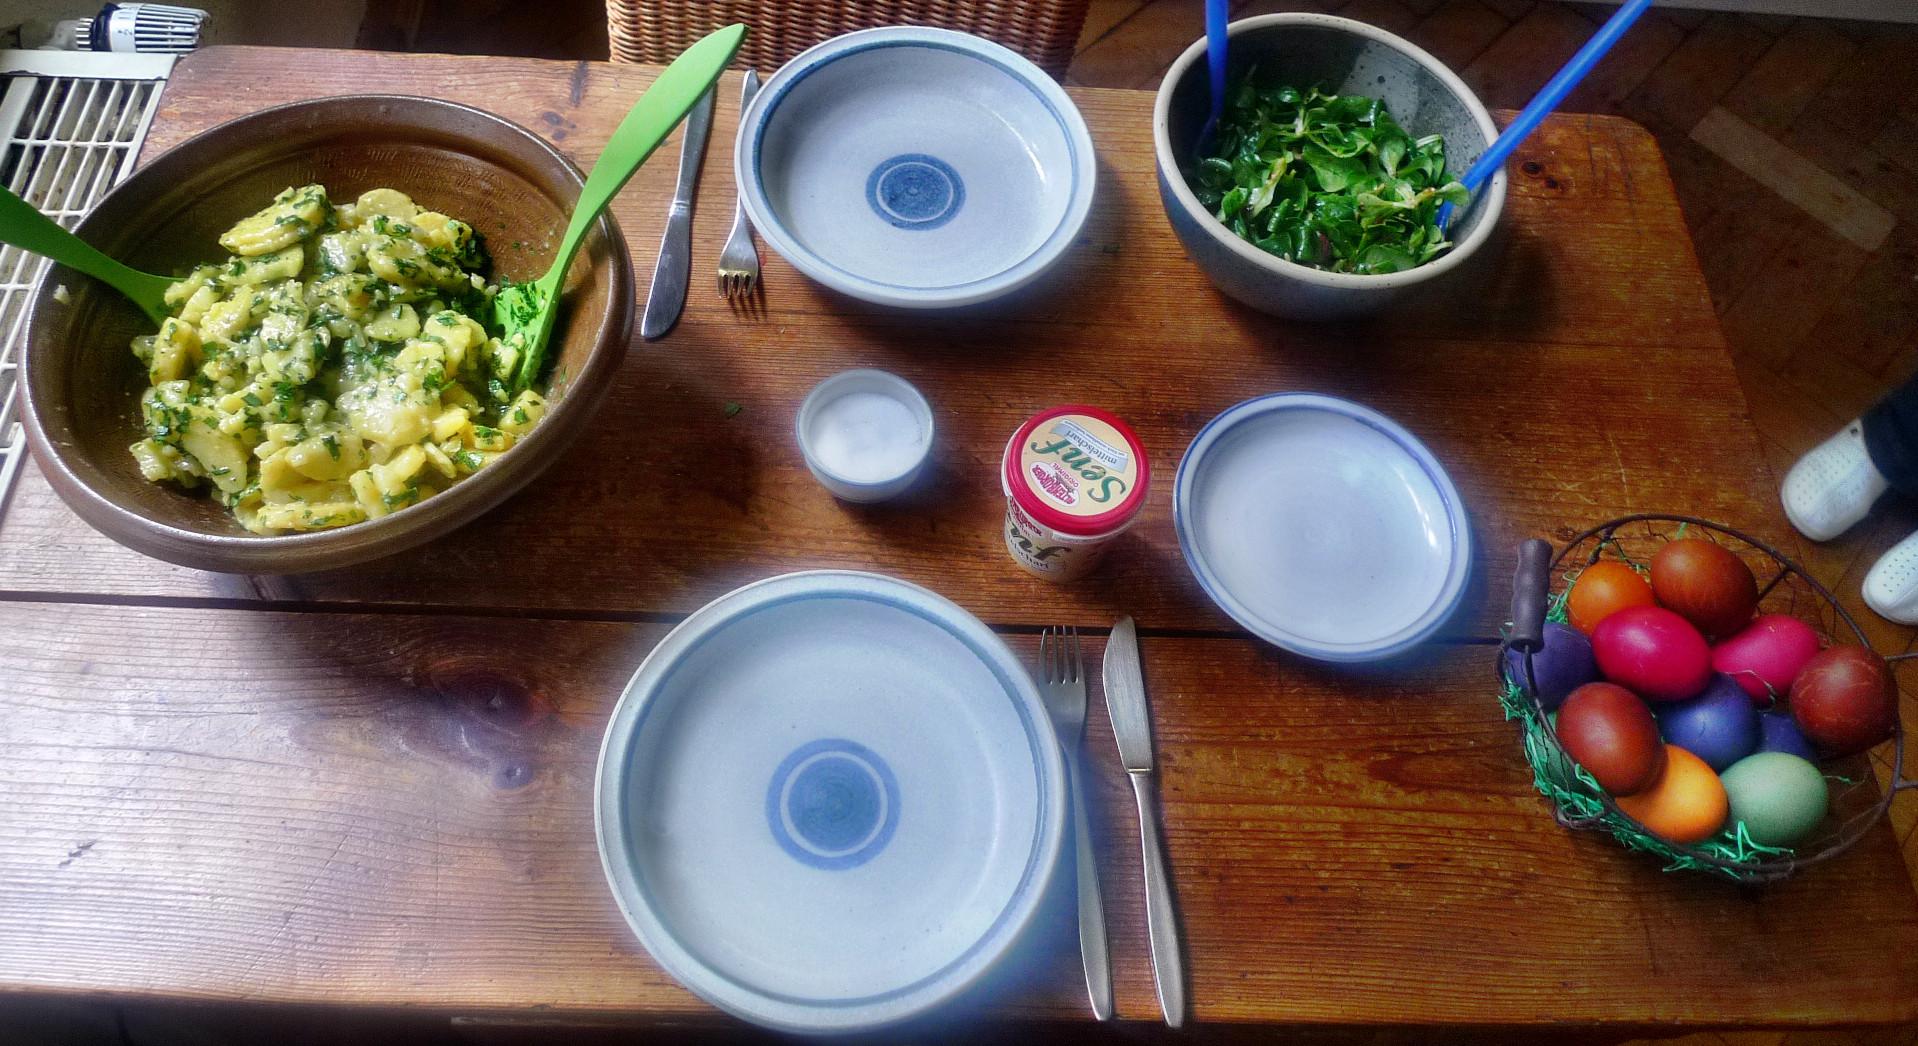 Kartoffelsalat mit Bärlauch,Feldsalat,Ostereier - 6.4.15   (4)